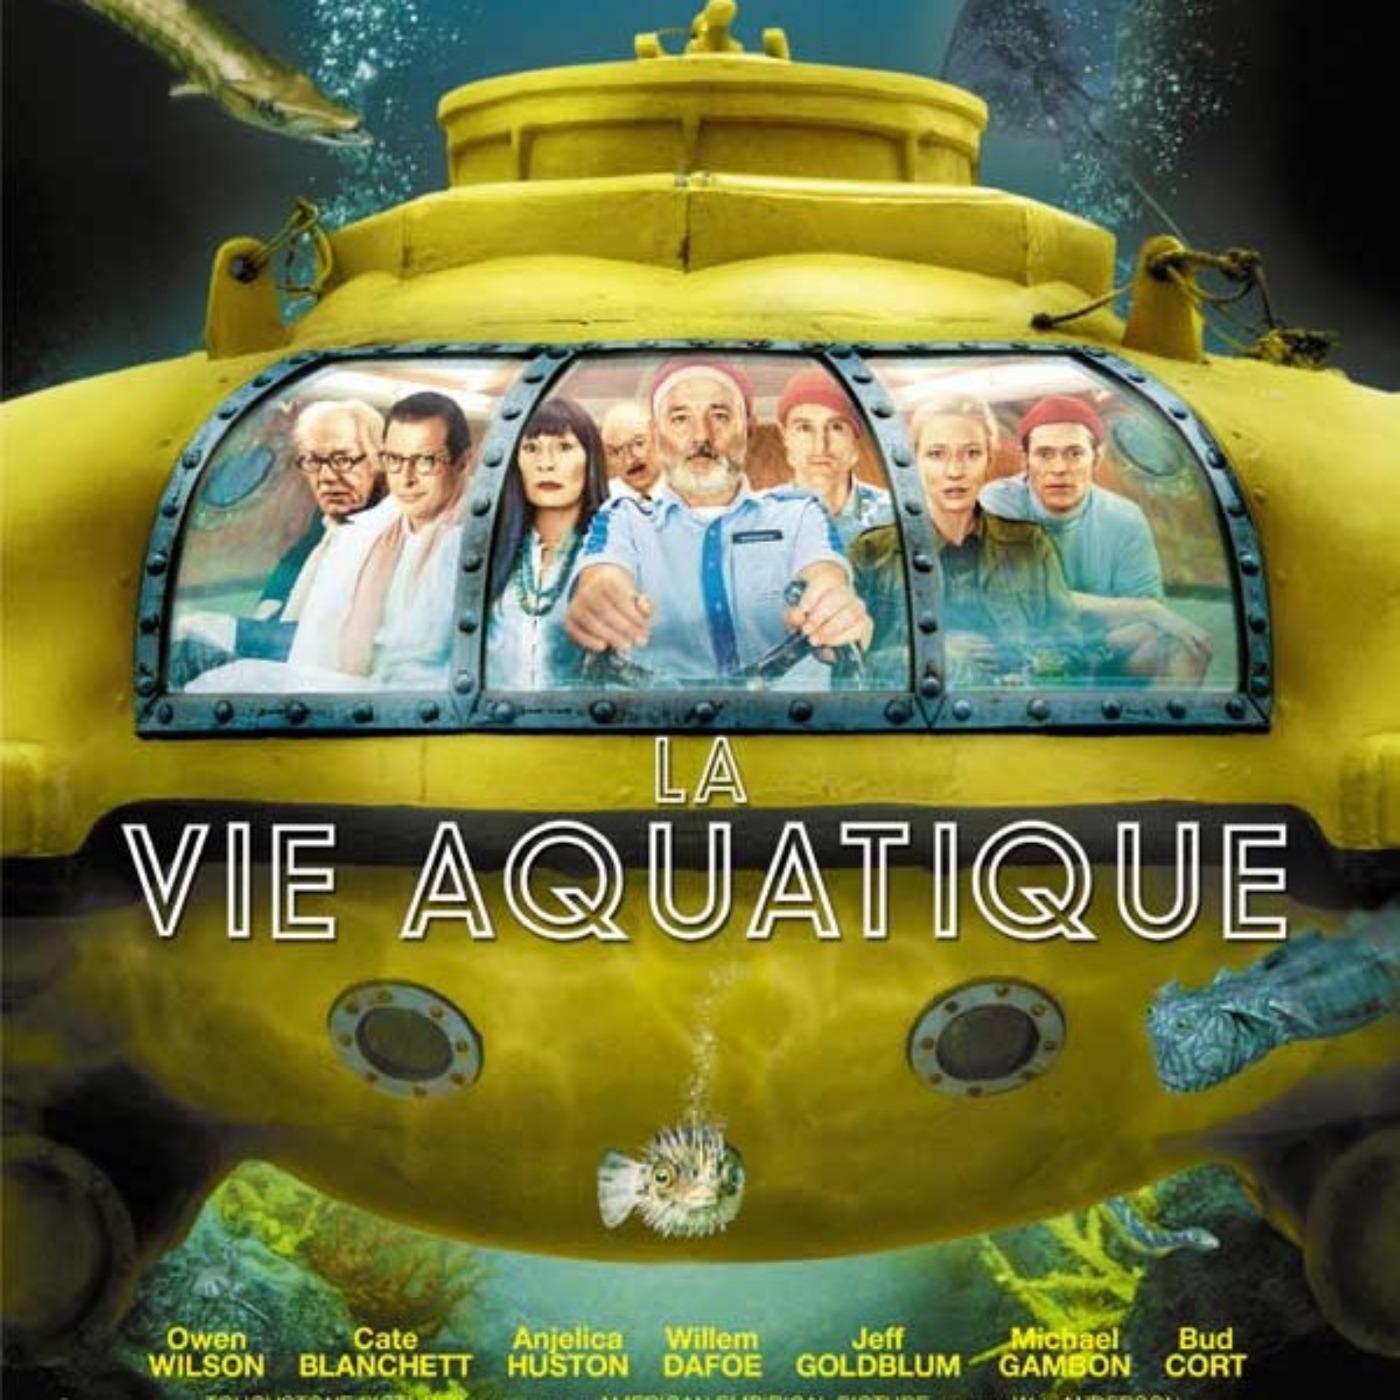 PODCAST CINEMA | critique du film LA VIE AQUATIQUE | CinéMaRadio